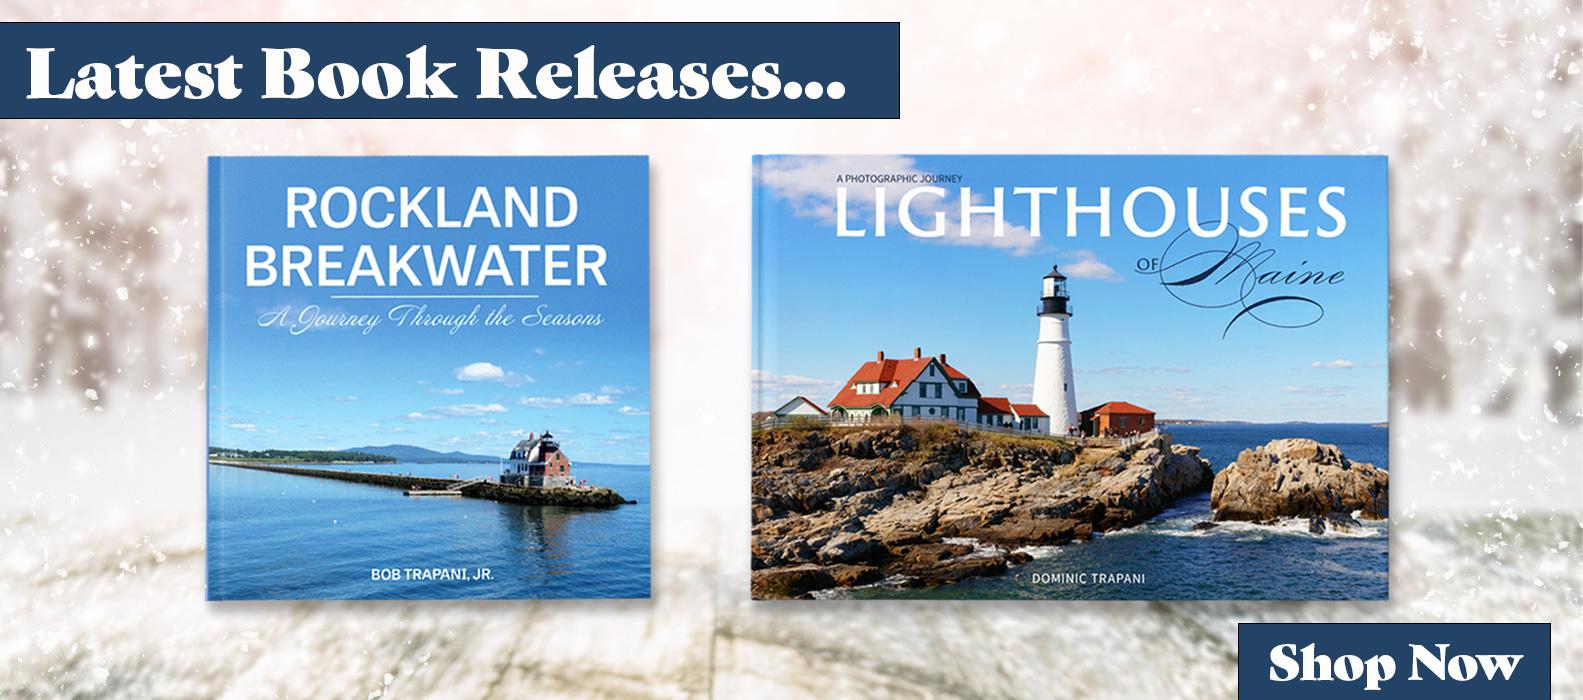 Shop Lighthouse Books